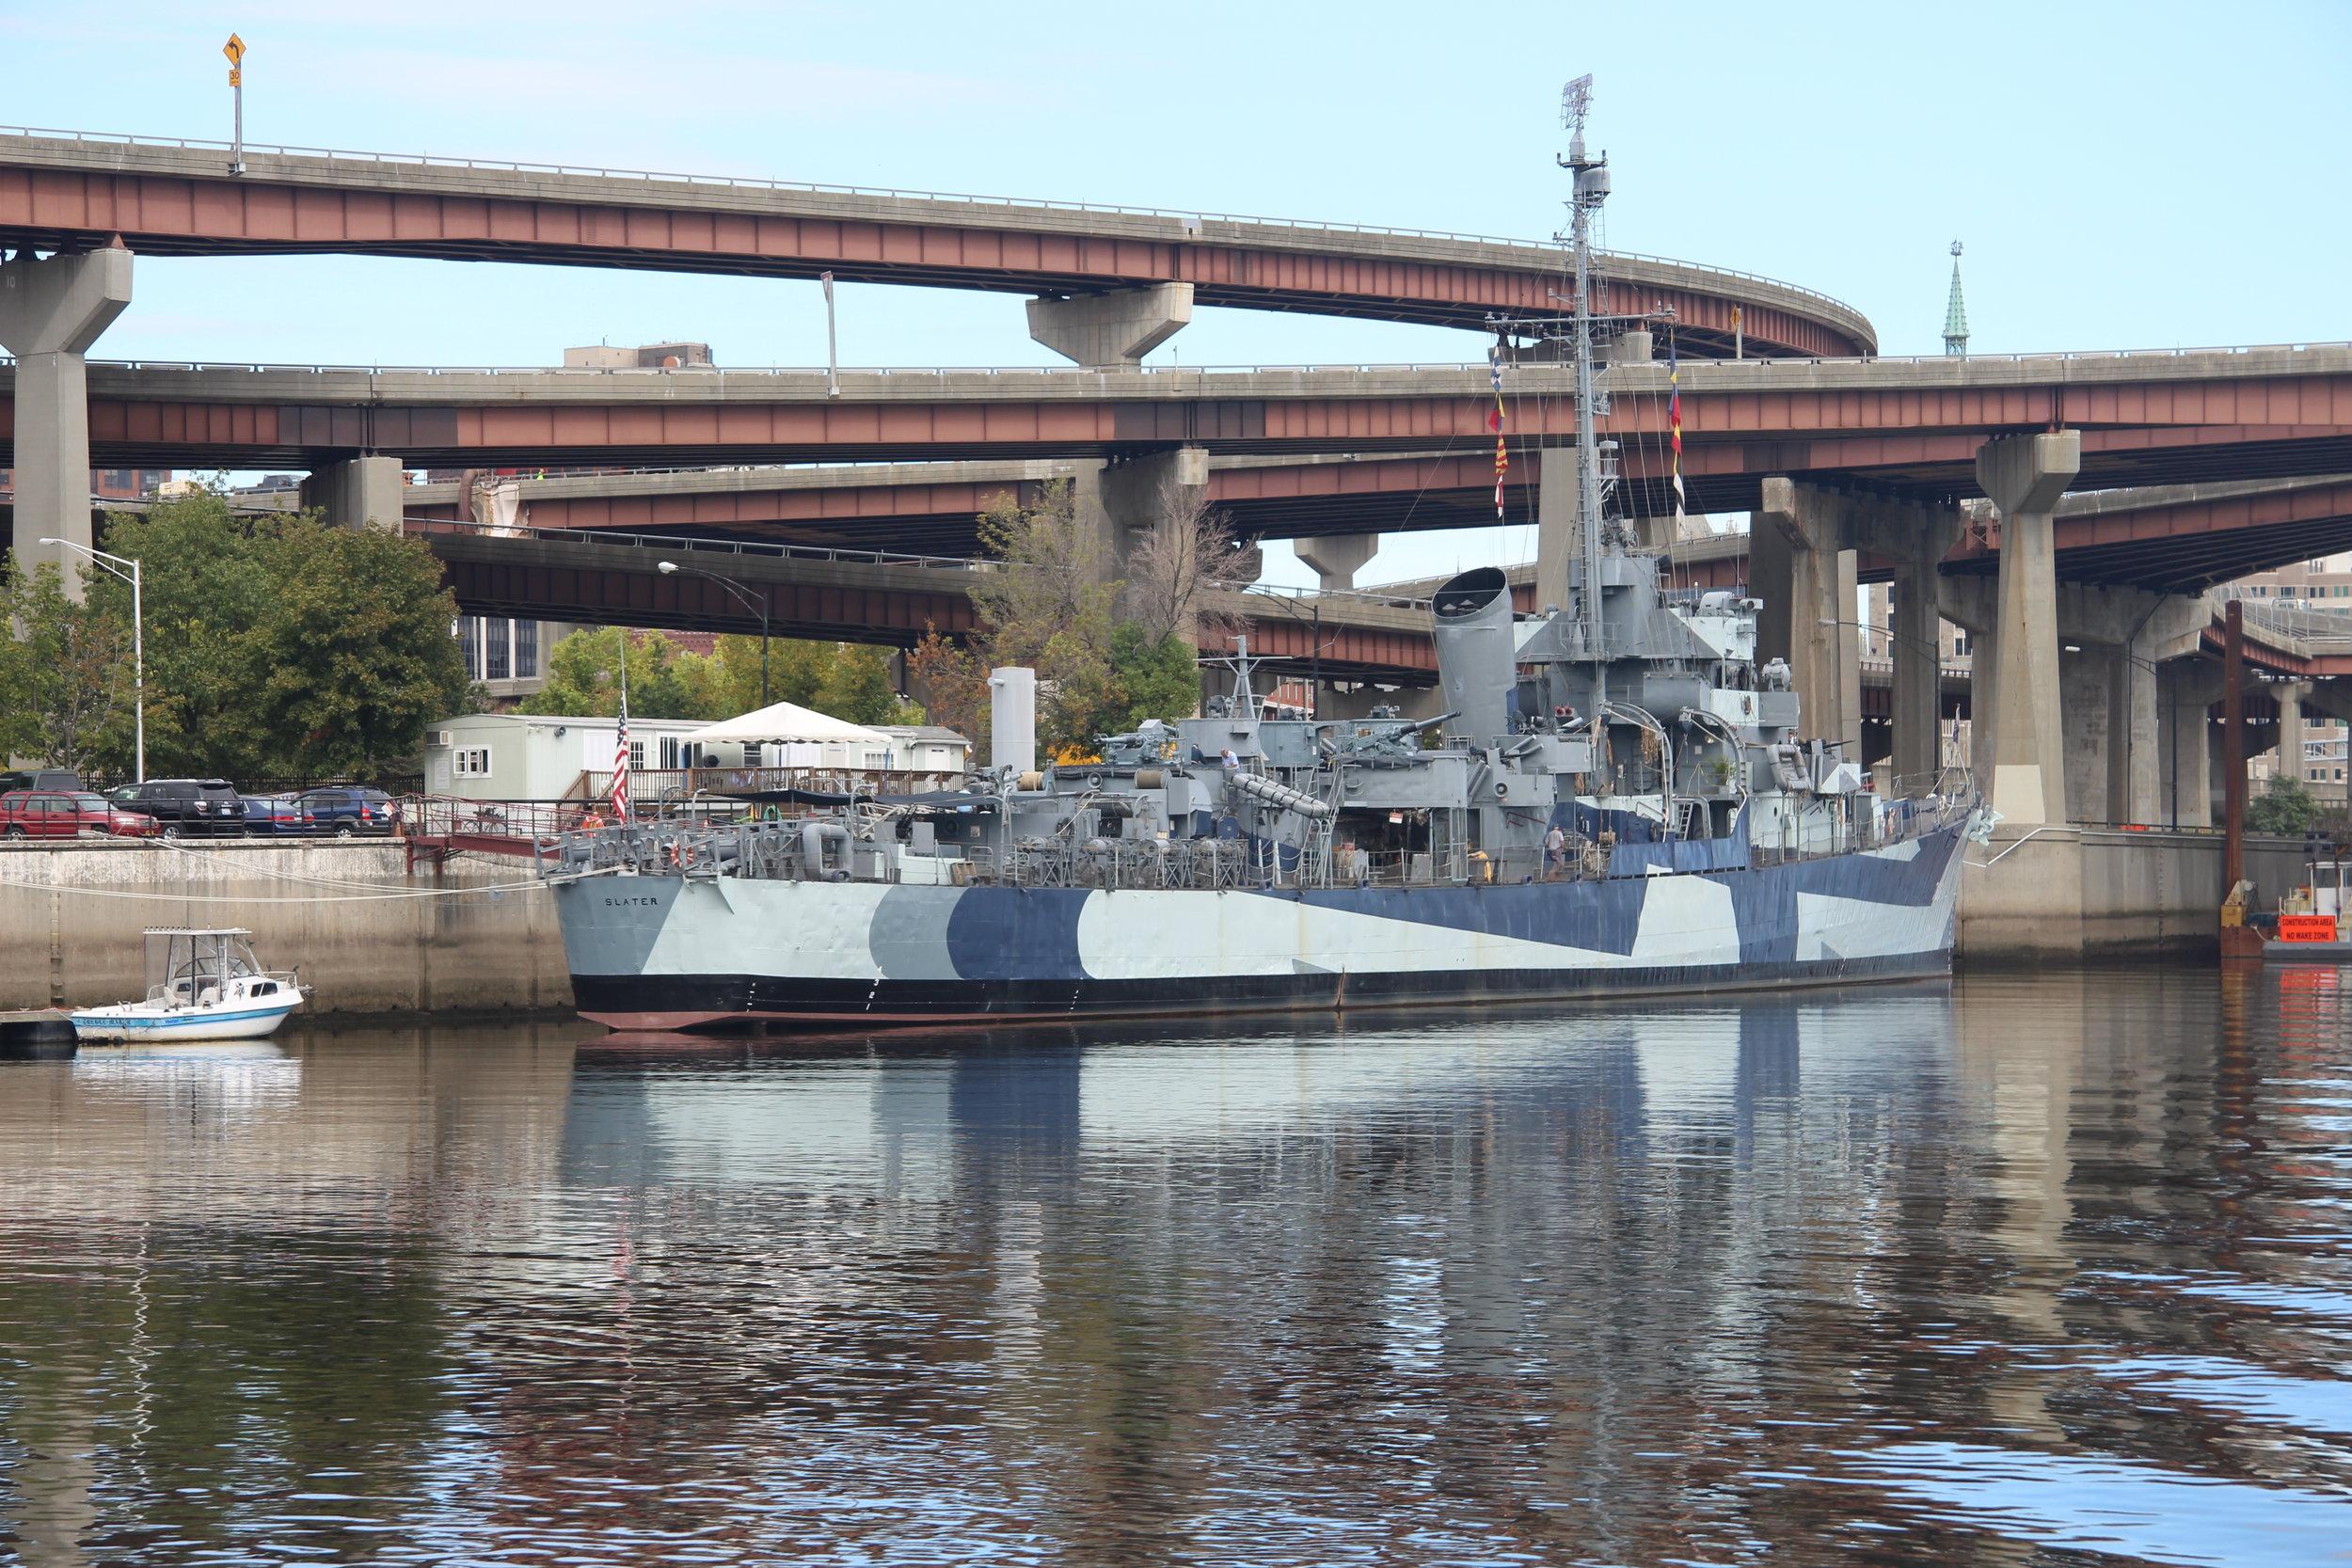 The battleship.